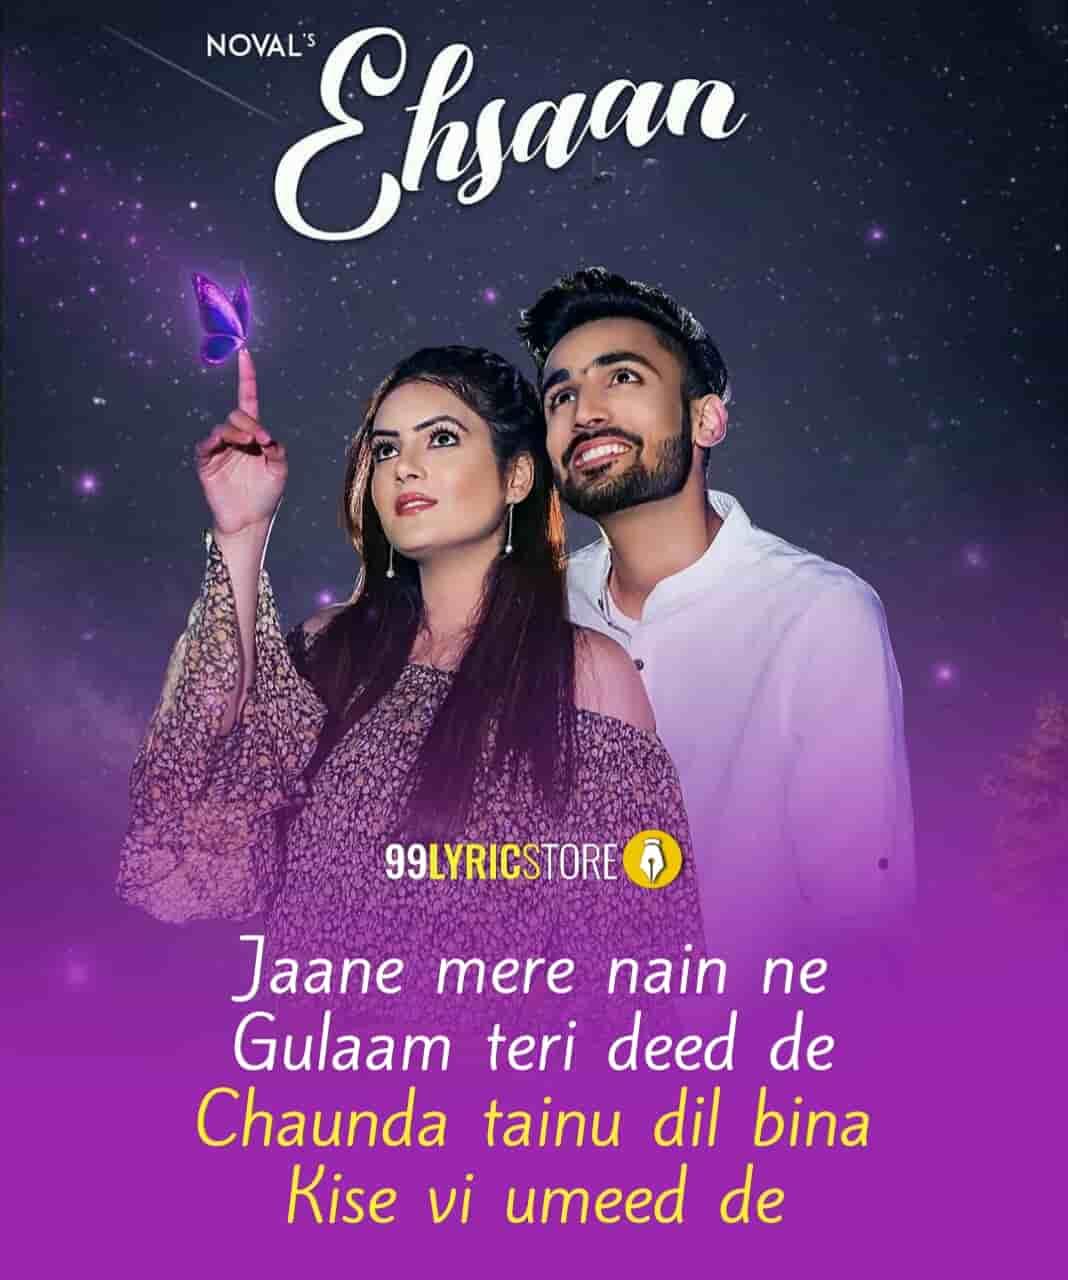 Ehsaan Punjabi song sung by Noval